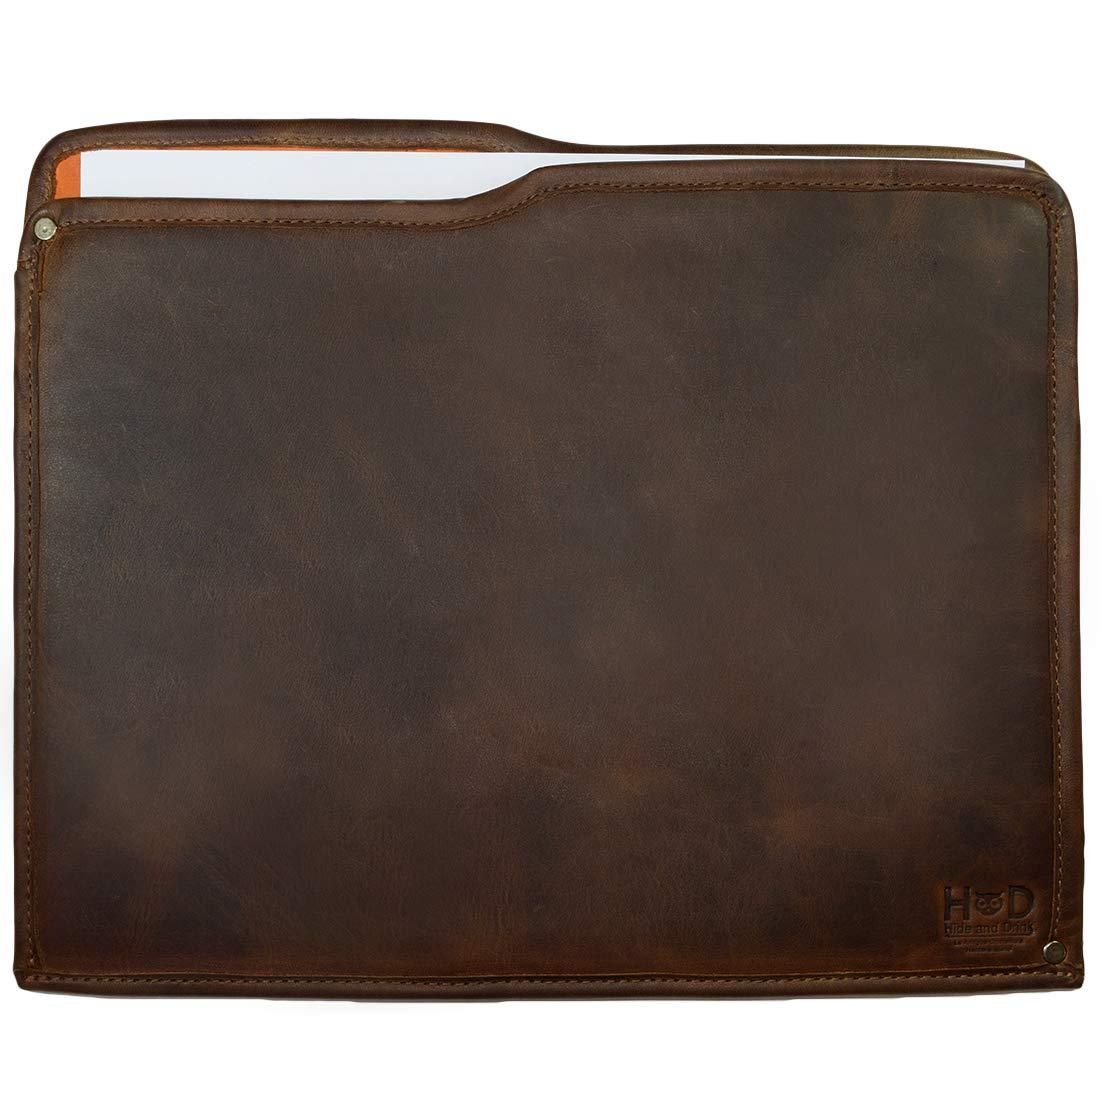 Hide & Drink, Rustic Leather Manila Folder, Document Holder/Office & Work Essentials Handmade, Includes 101 Year Warranty :: Bourbon Brown by Hide & Drink